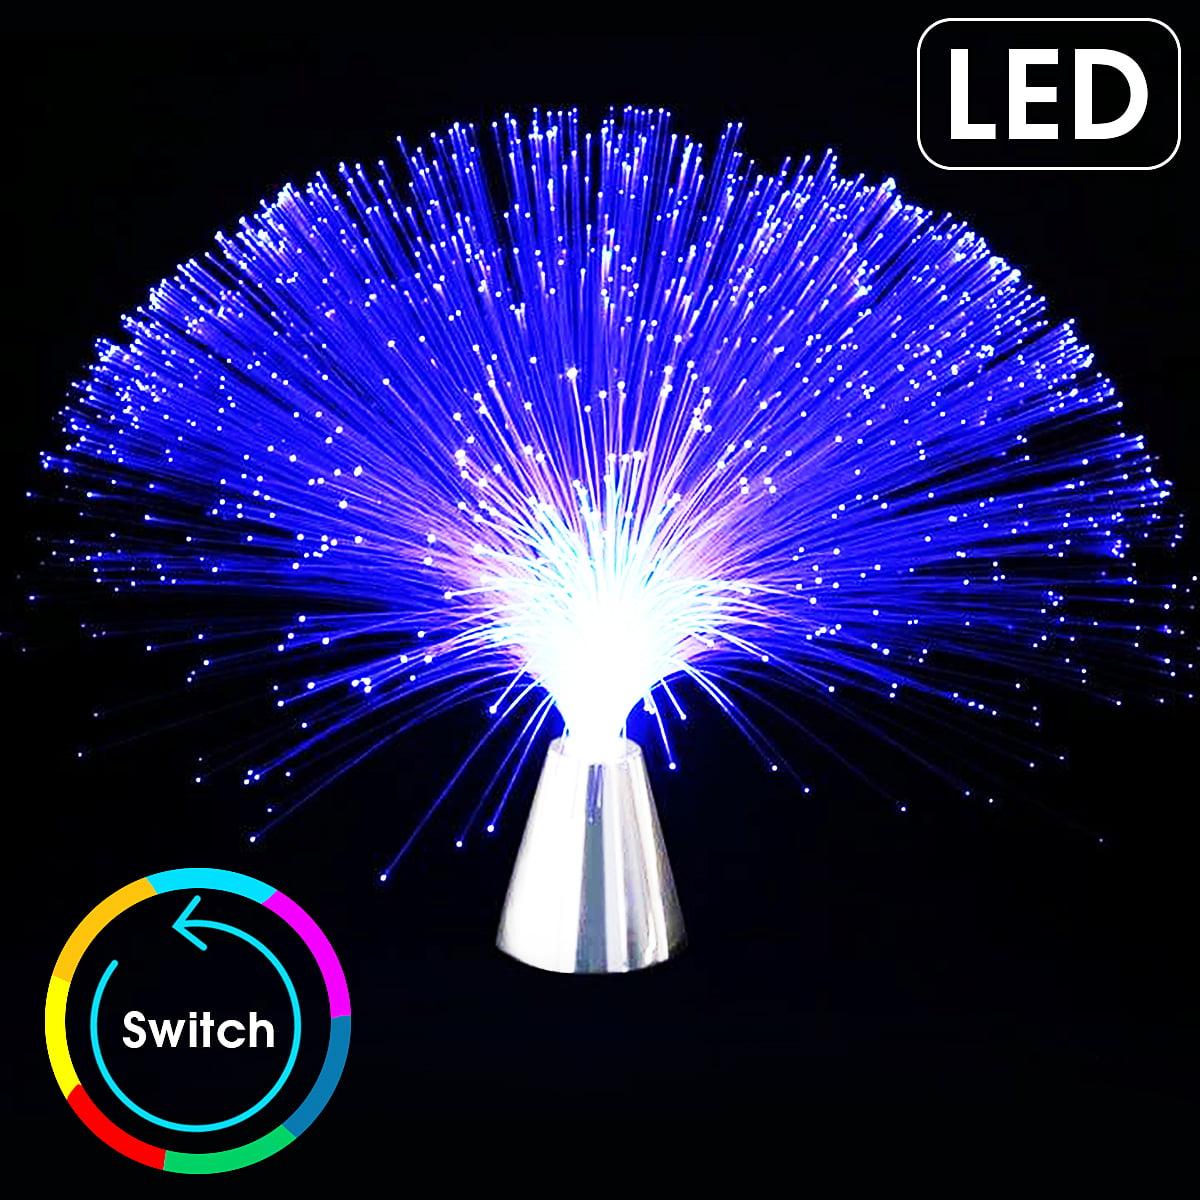 LED Fiber Optic Night Light Lamp Flashing Colorful Multicolor Toy Romantic Home Room Decor